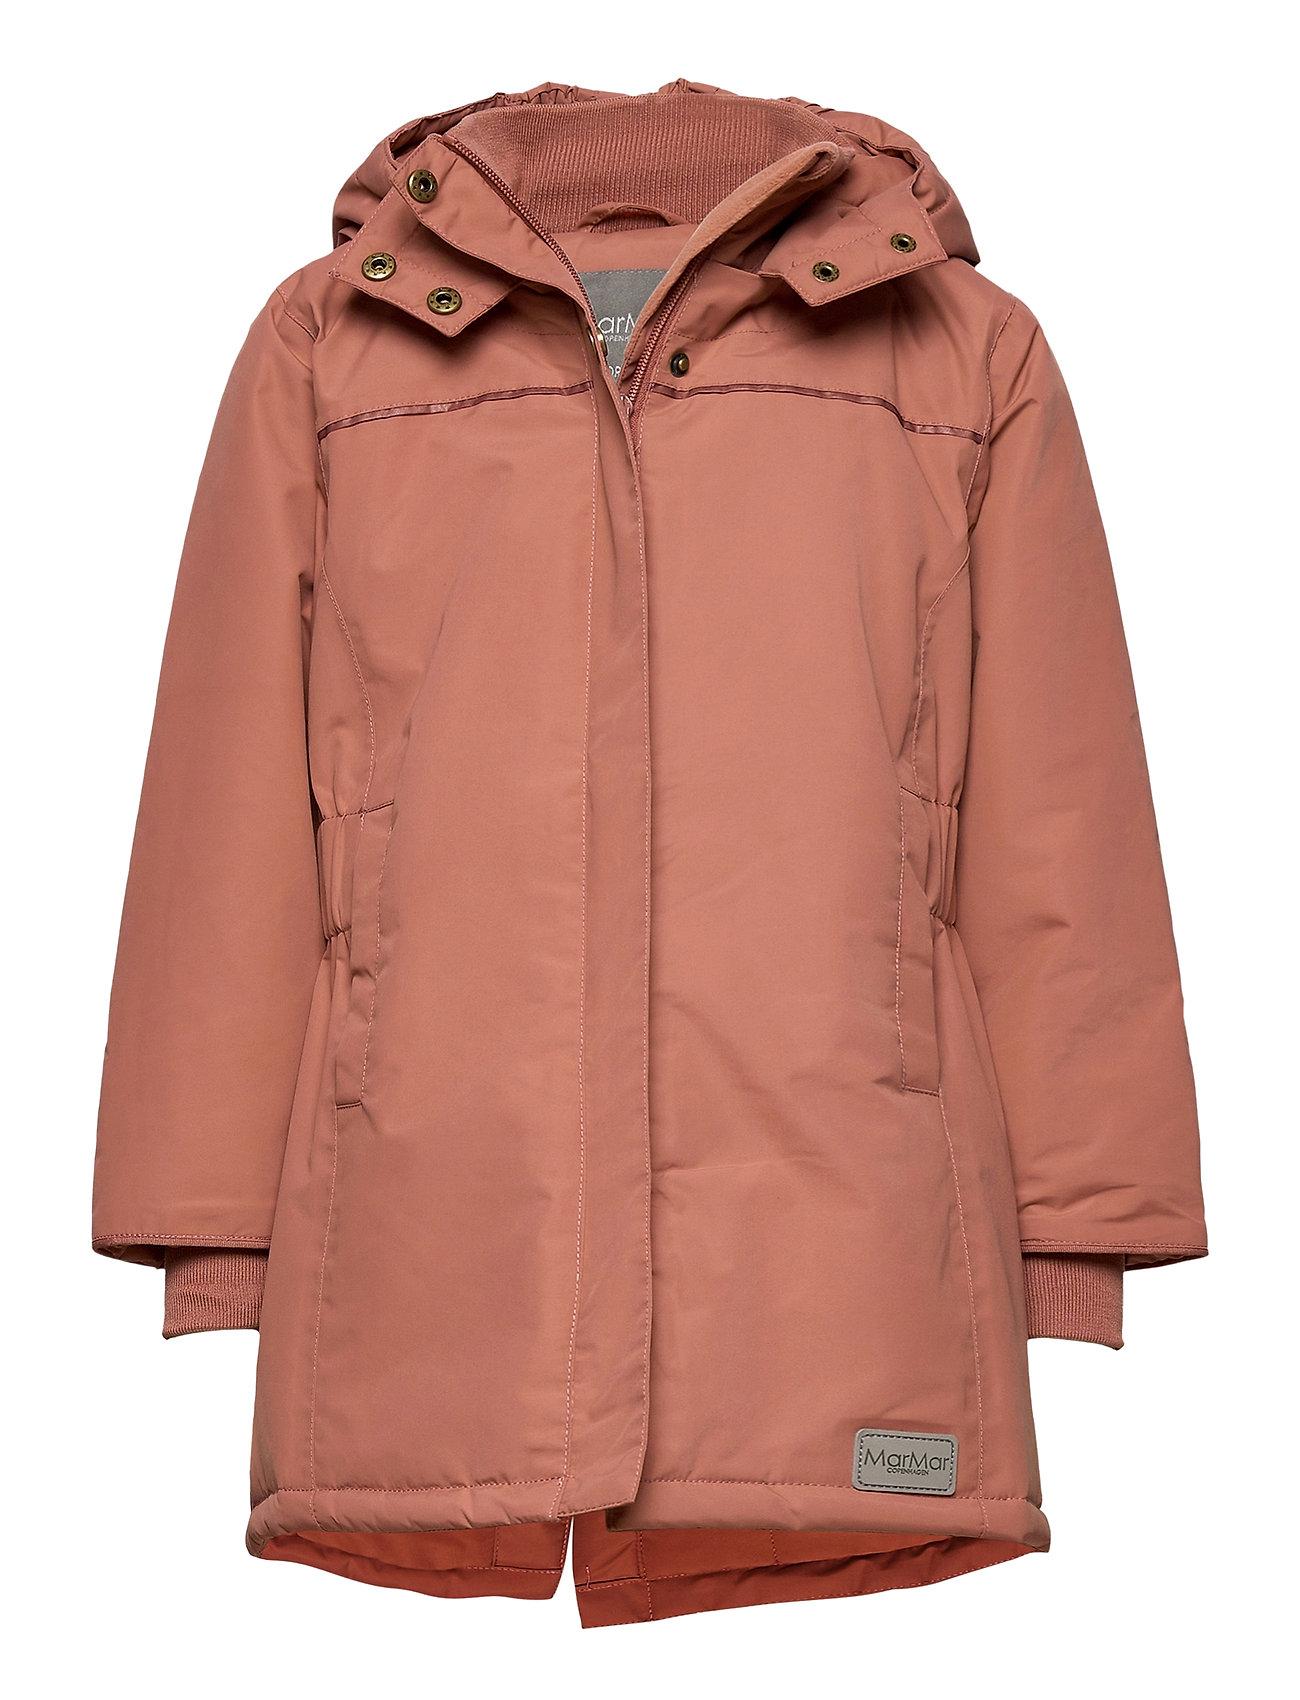 MarMar Cph Olga Technical Outerwear - ROSE BLUSH